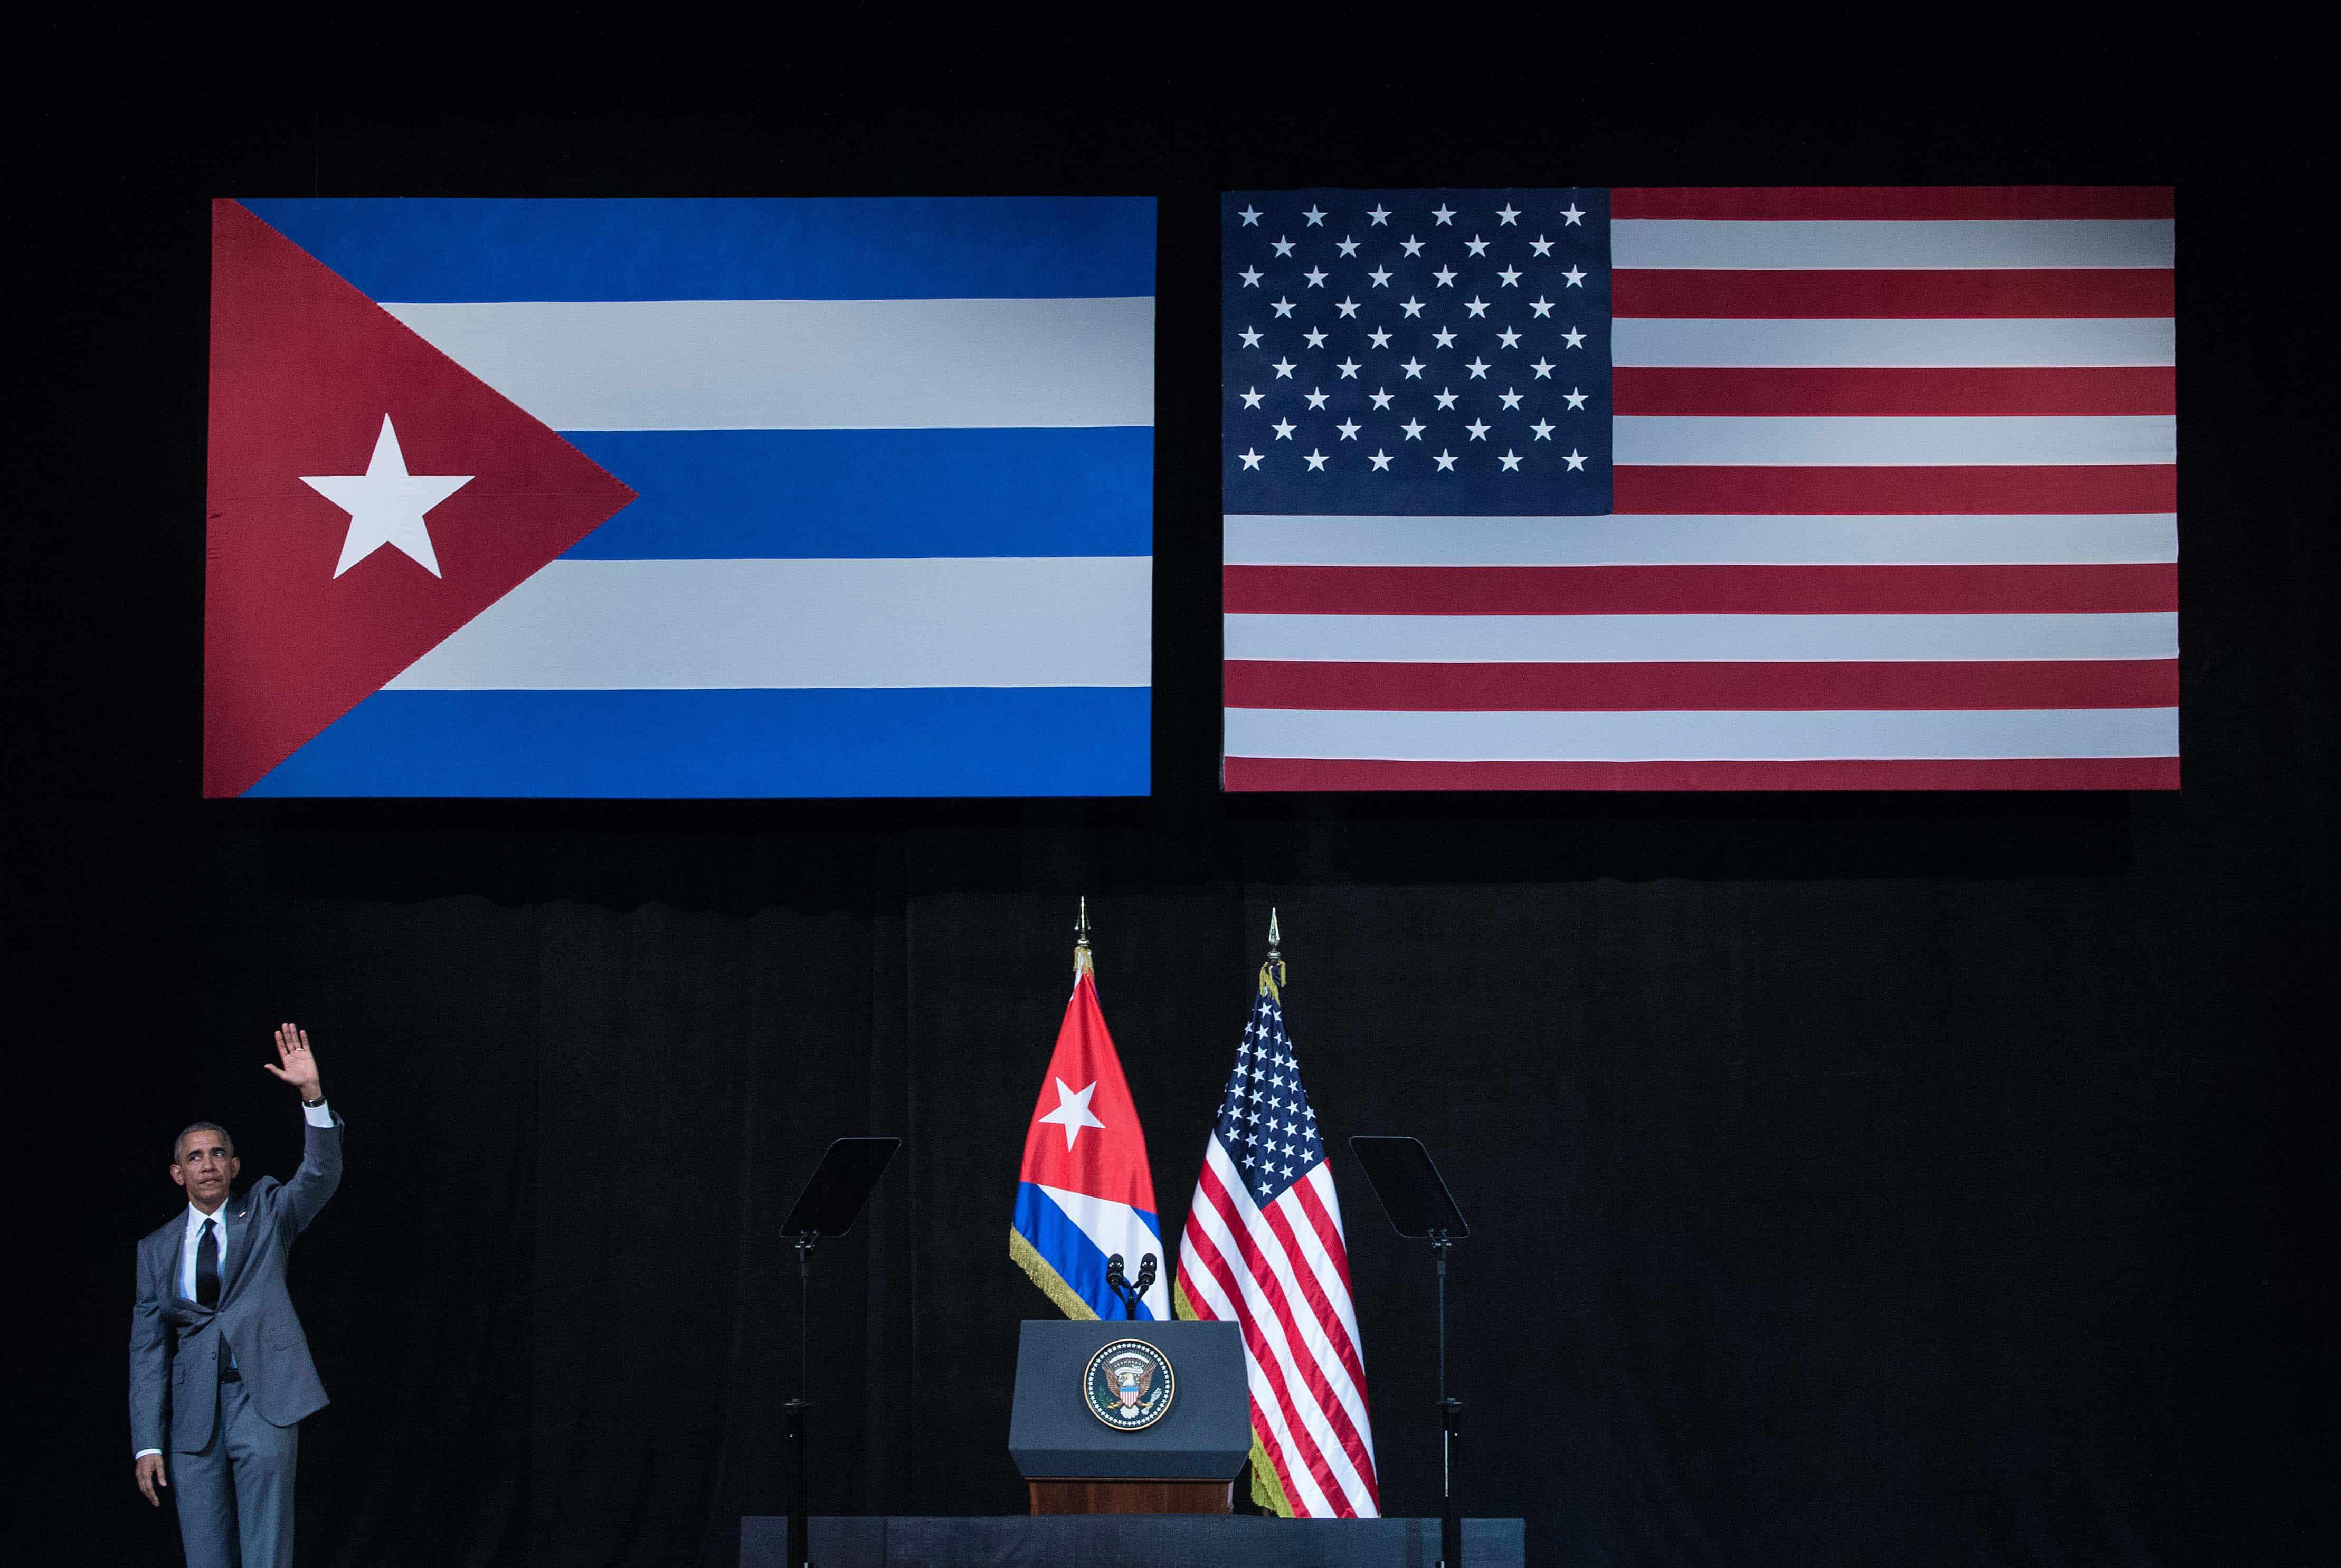 Obama in Cuba | speech